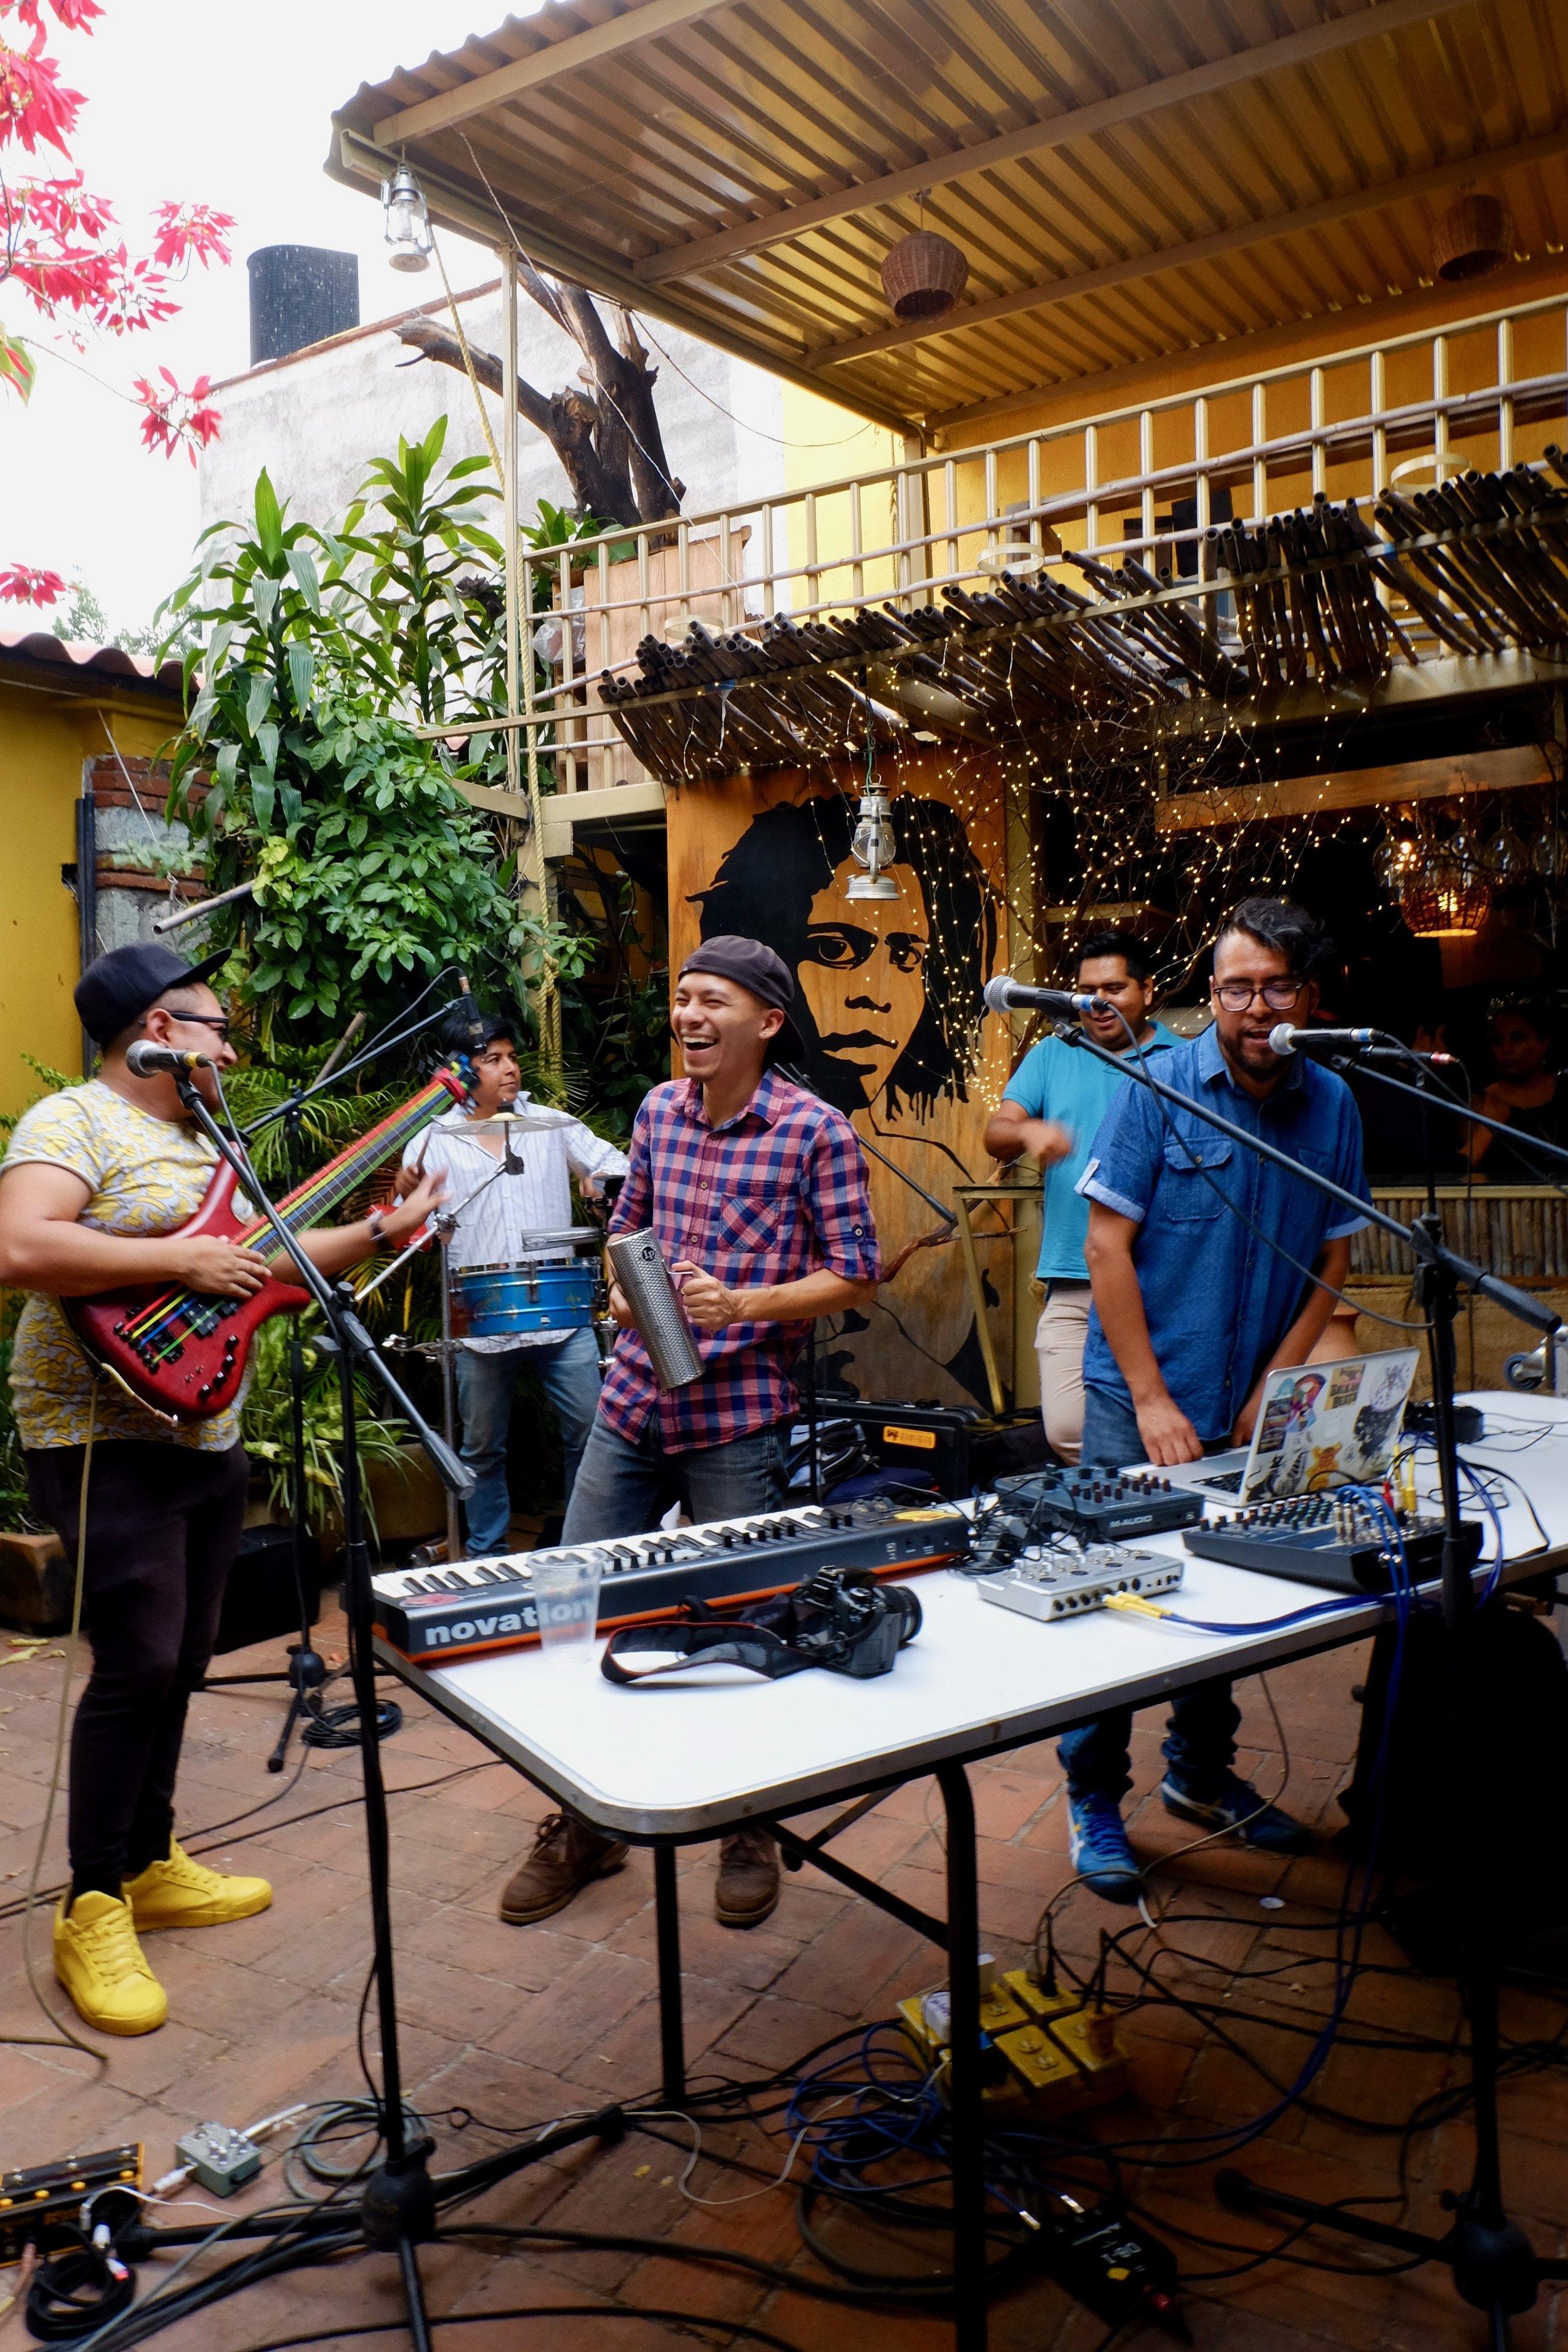 Live music should be mandatory at a beerfest. Oaxaca gets it.